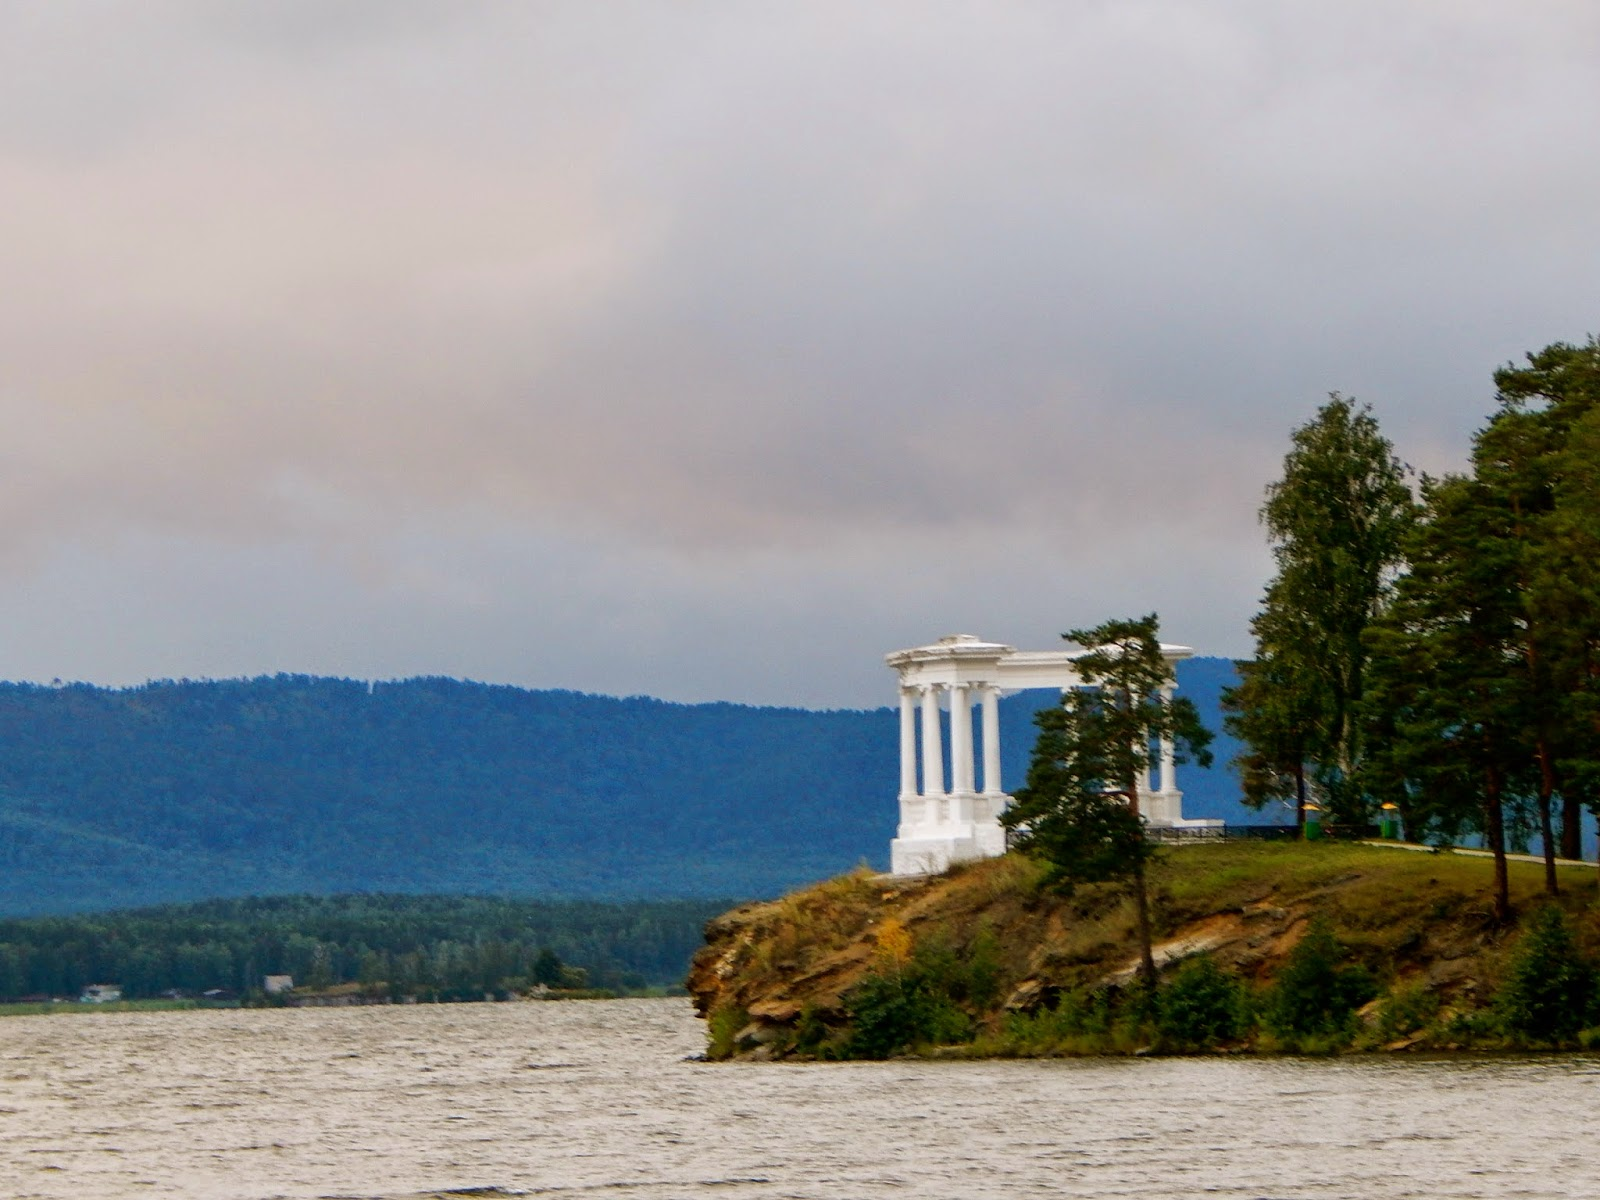 Elena Komleva Blog: My Trip to Russia Part 2. Ozersk.1